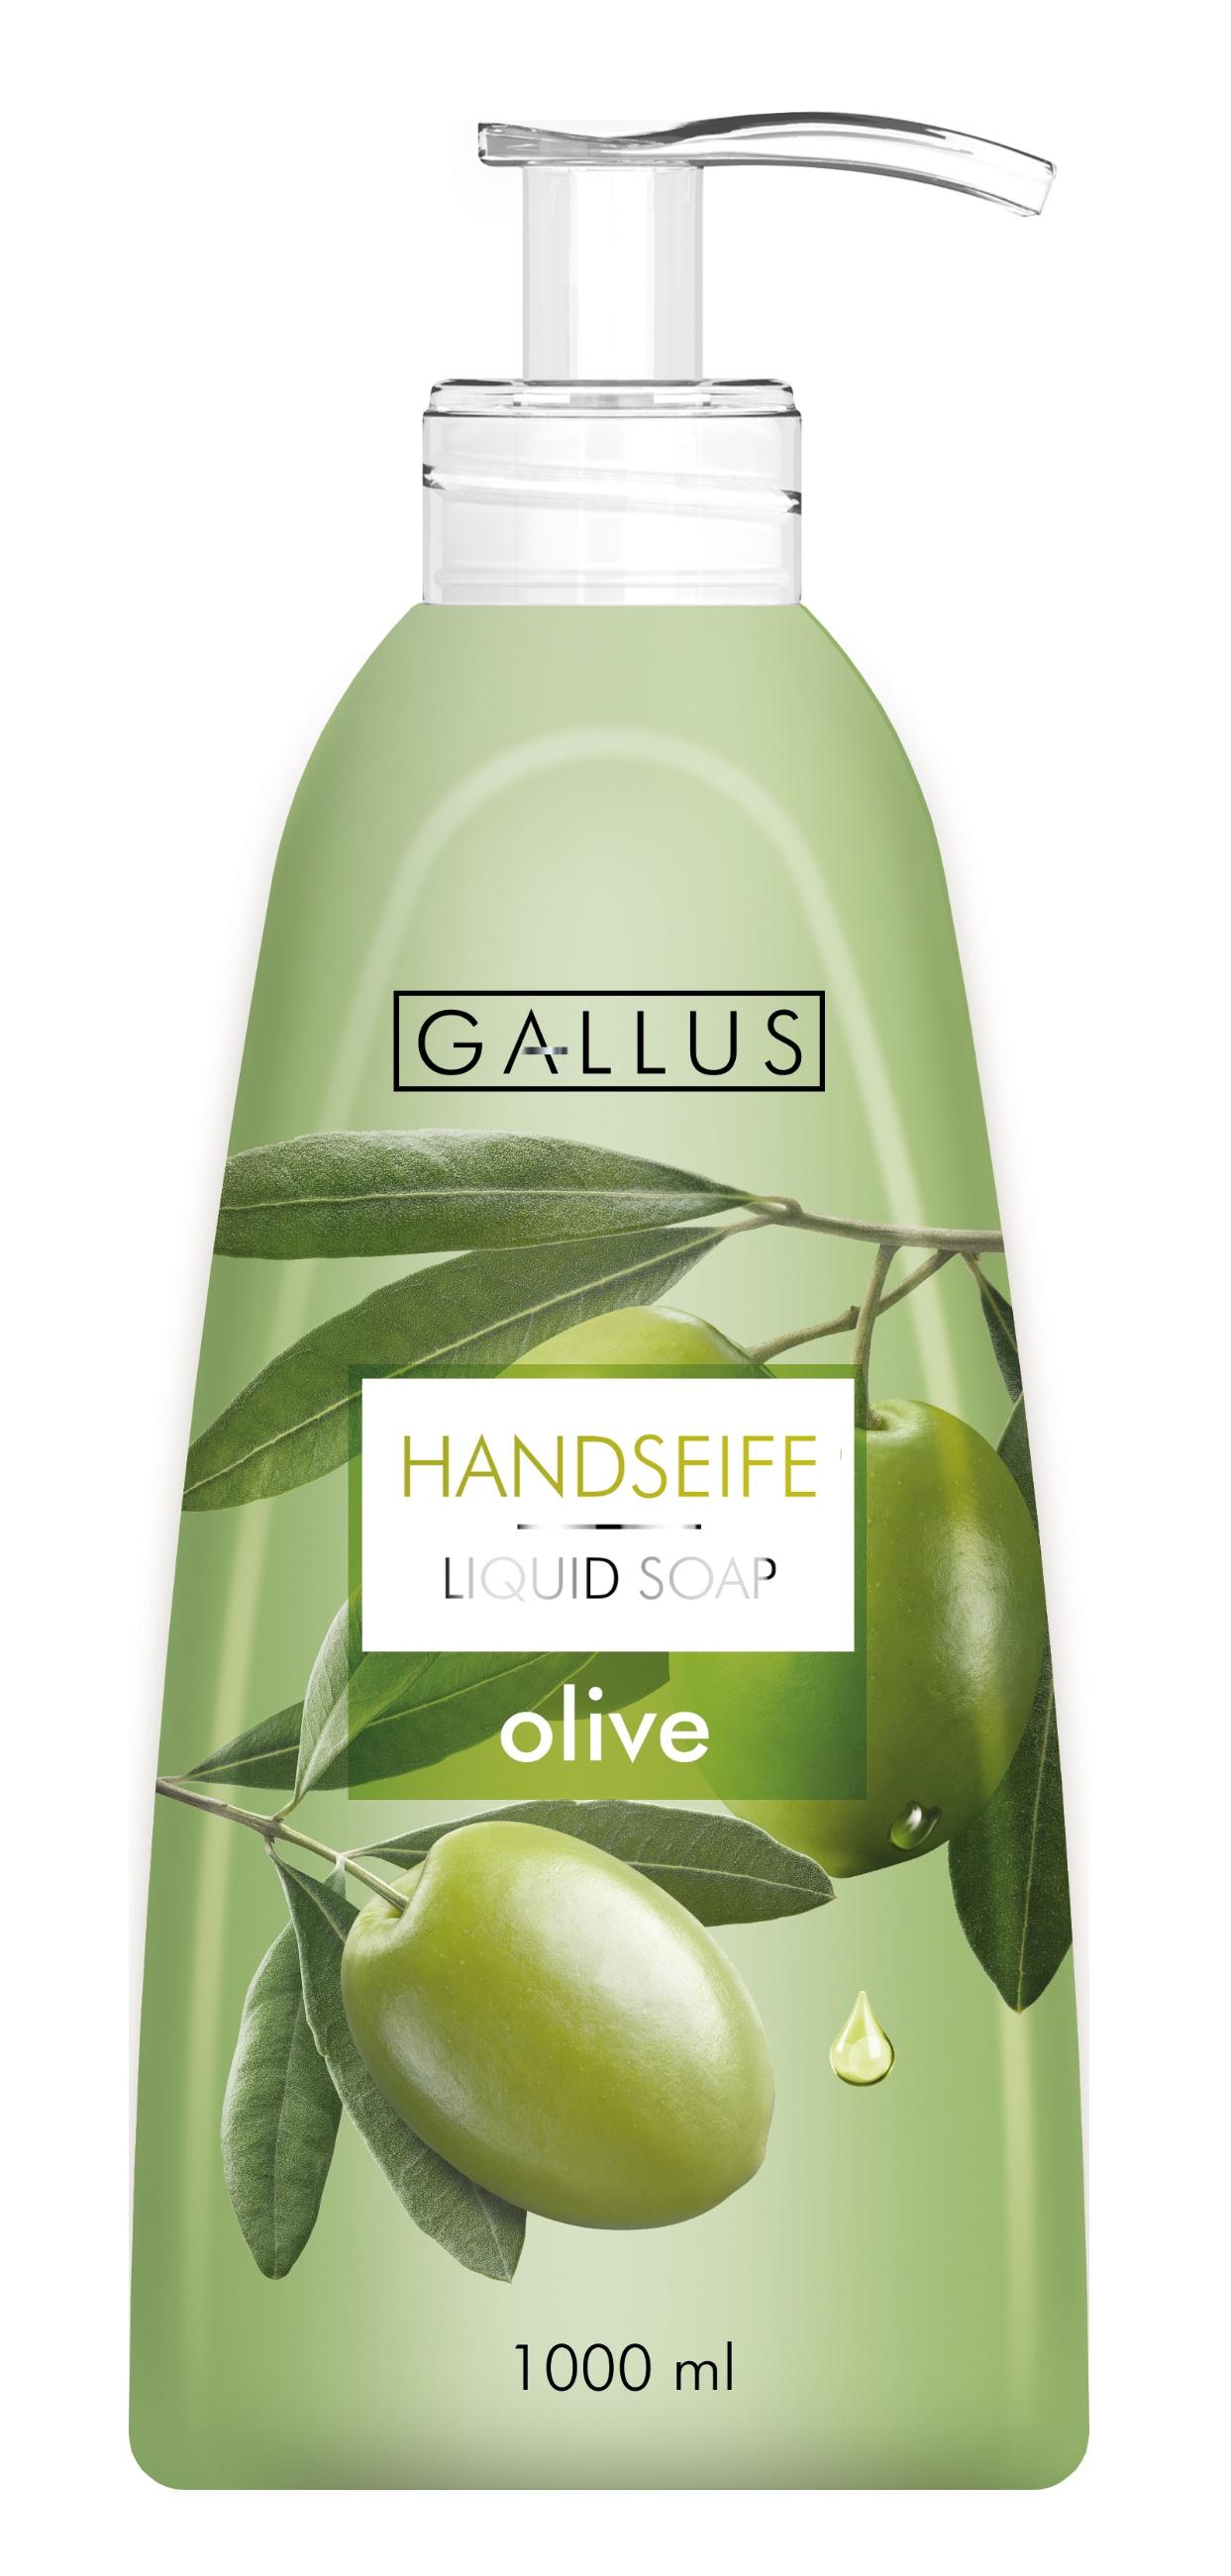 Жидкое мыло Gallus, Оливка, 1 л